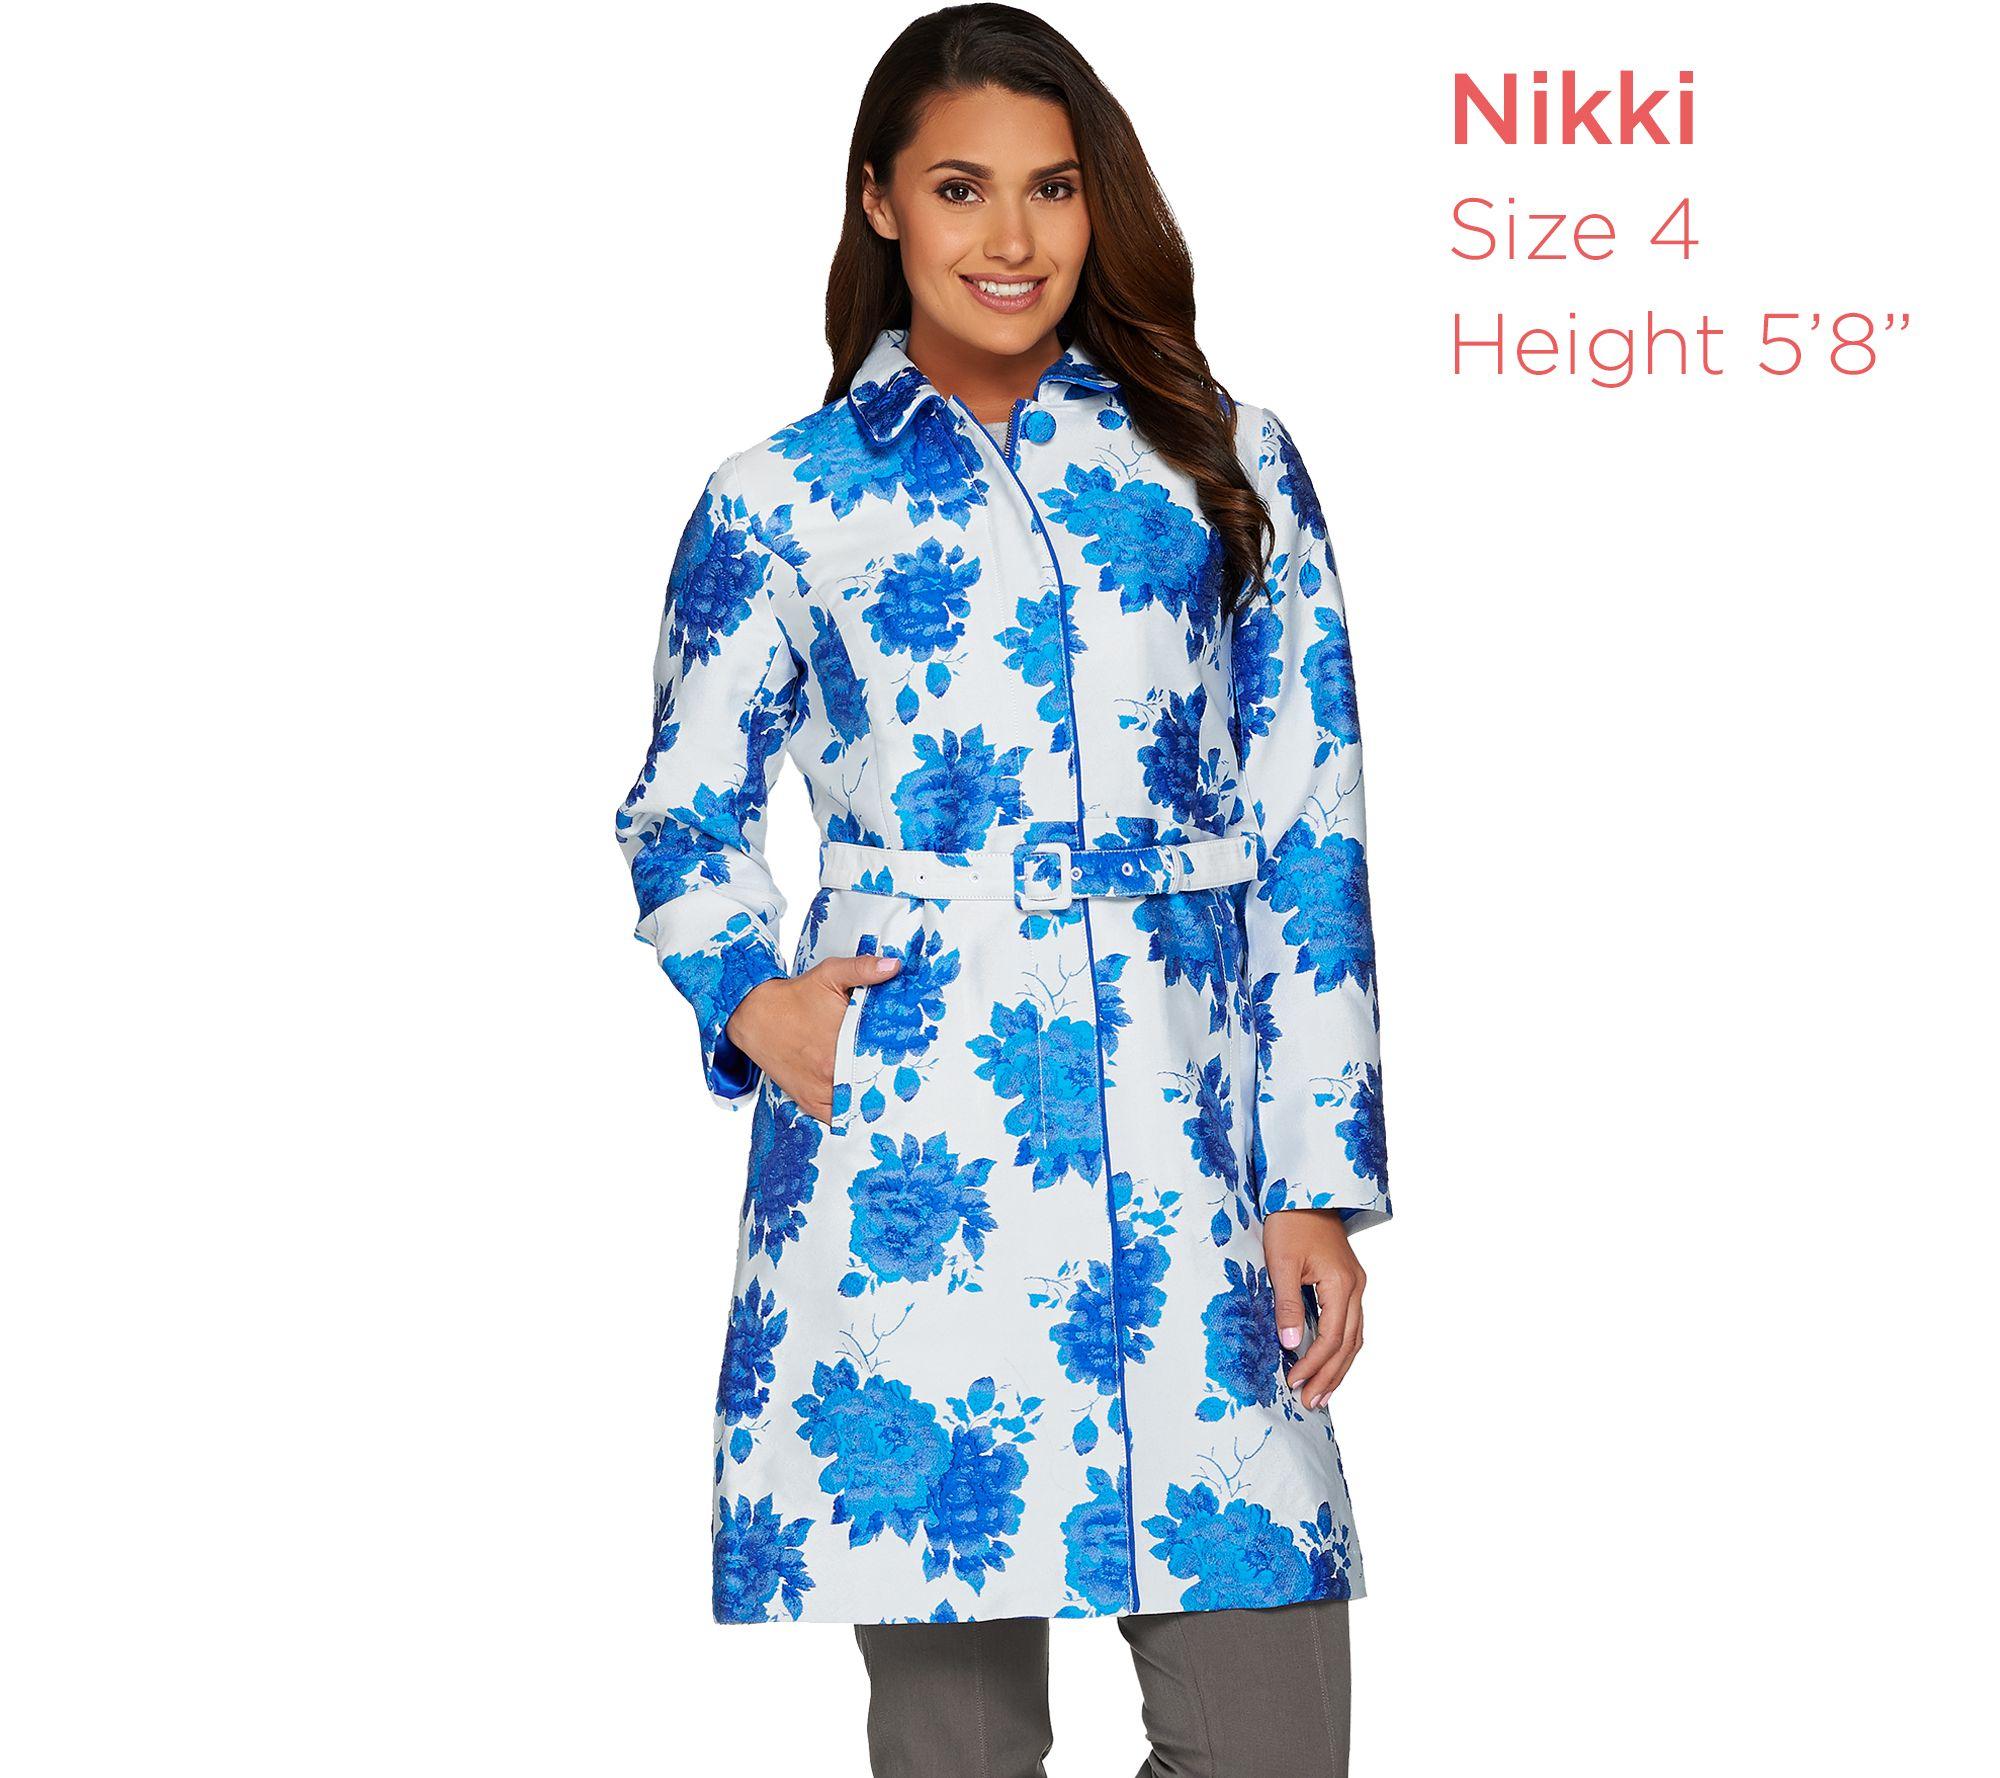 5663b4b87cbd9 Isaac Mizrahi Live! Special Edition Floral Jacquard Topper Coat - Page 1 —  QVC.com